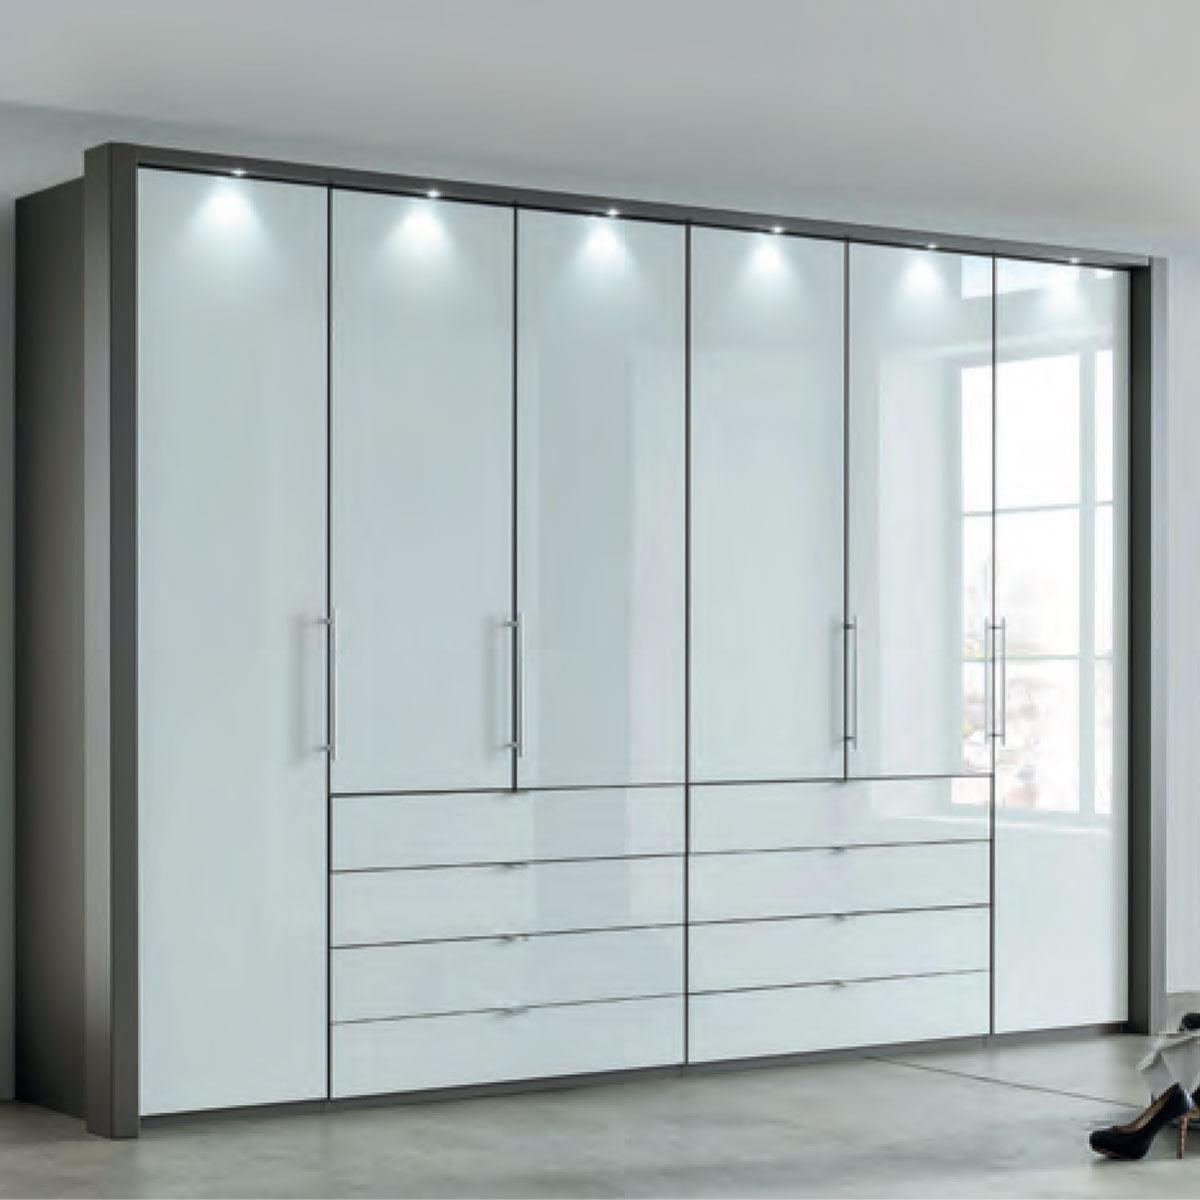 Wiemann Loft Dreh-Gleittüren-Panorama-Funktionsschrank 11 cm breit